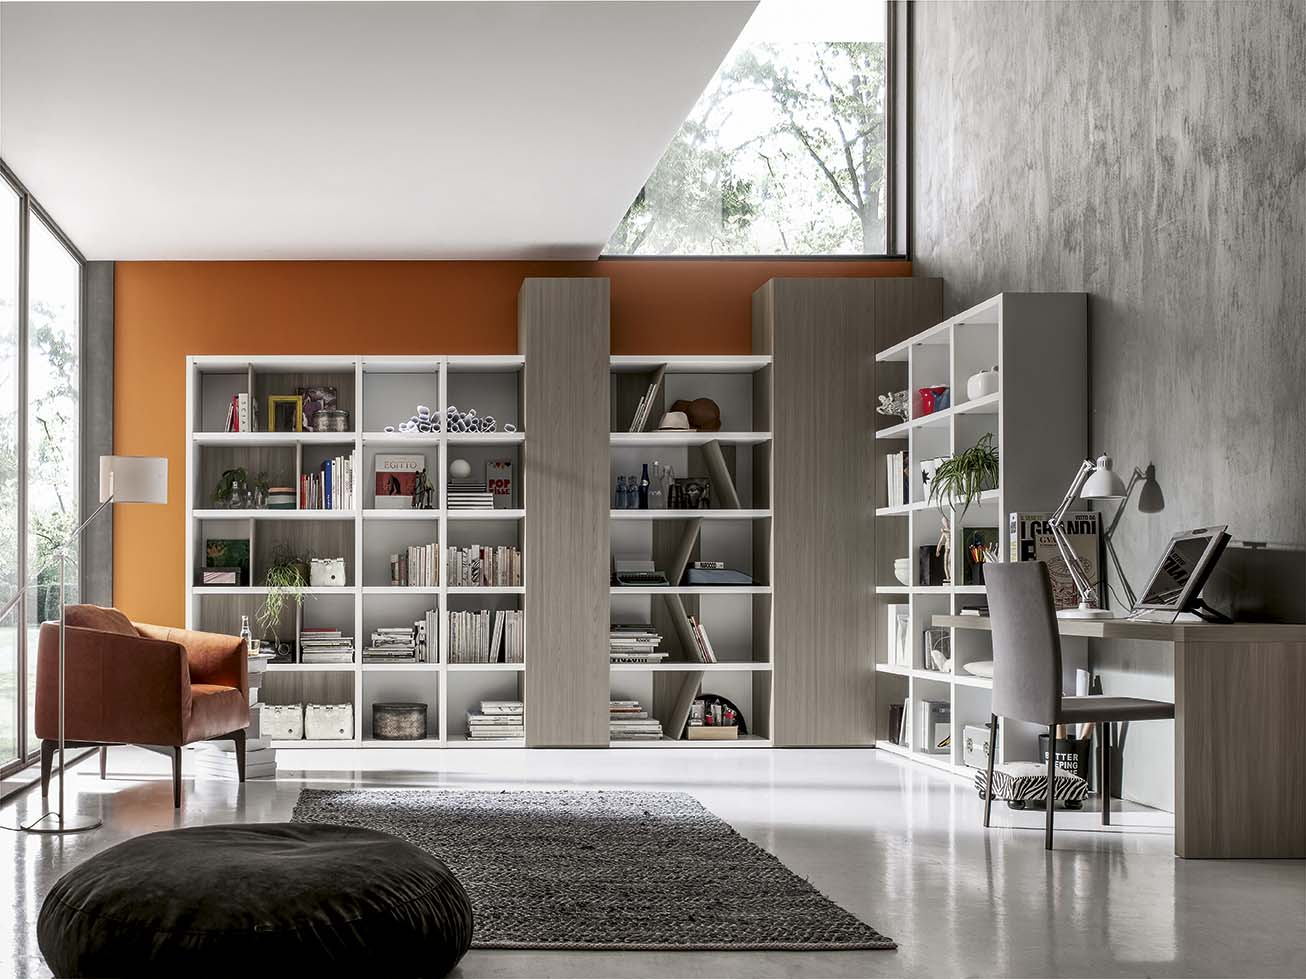 stile moderno | ab mobili - Mobili Moderni Udine